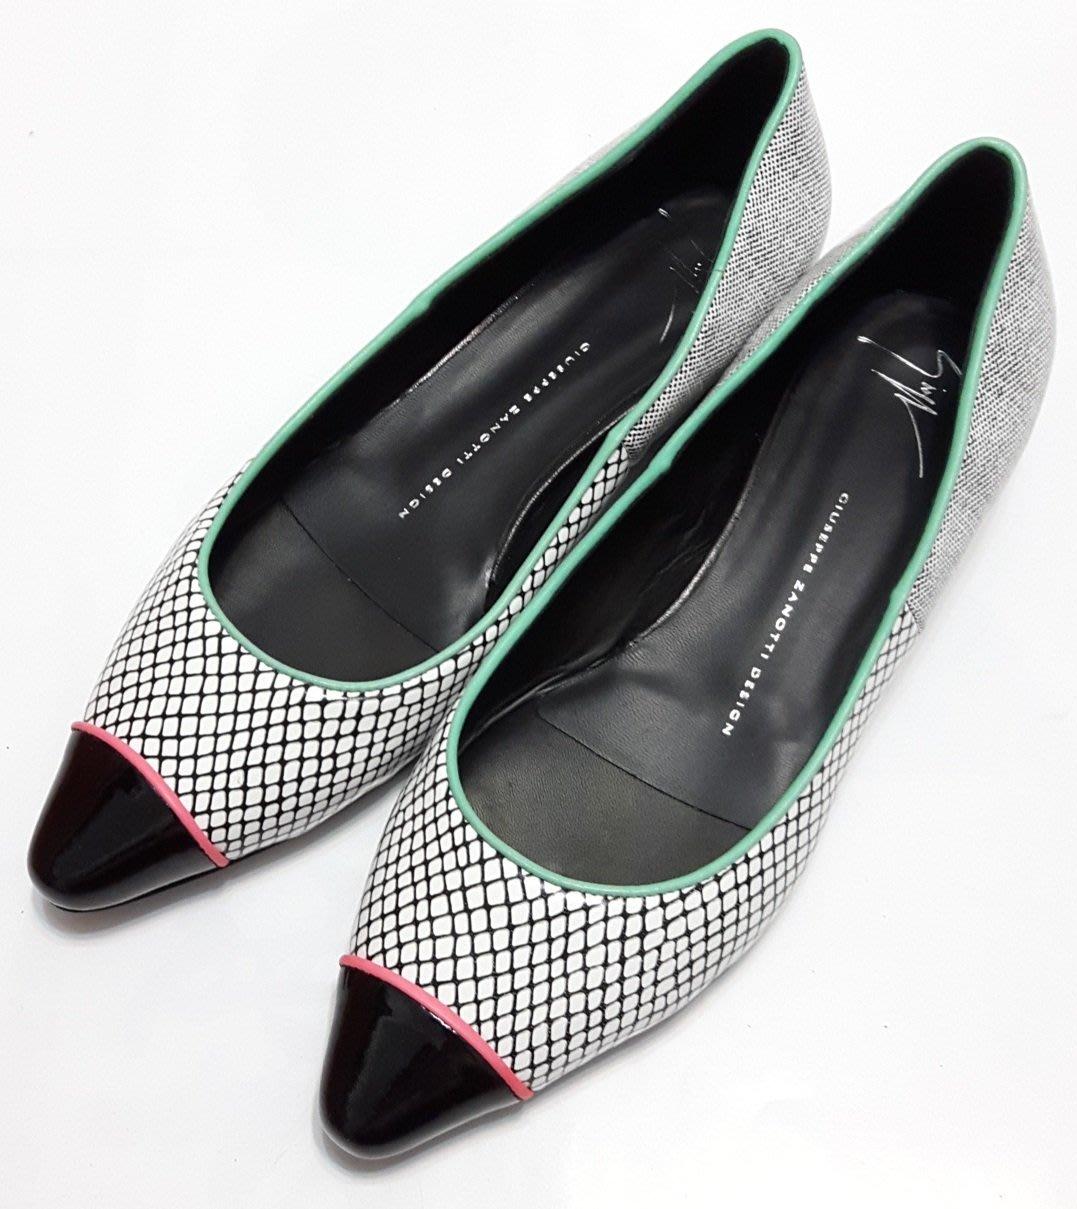 Giuseppe Zanotti Design 義大利製 全新 網格紋 平底鞋 尖頭包 低跟鞋 GZD 送口罩一片